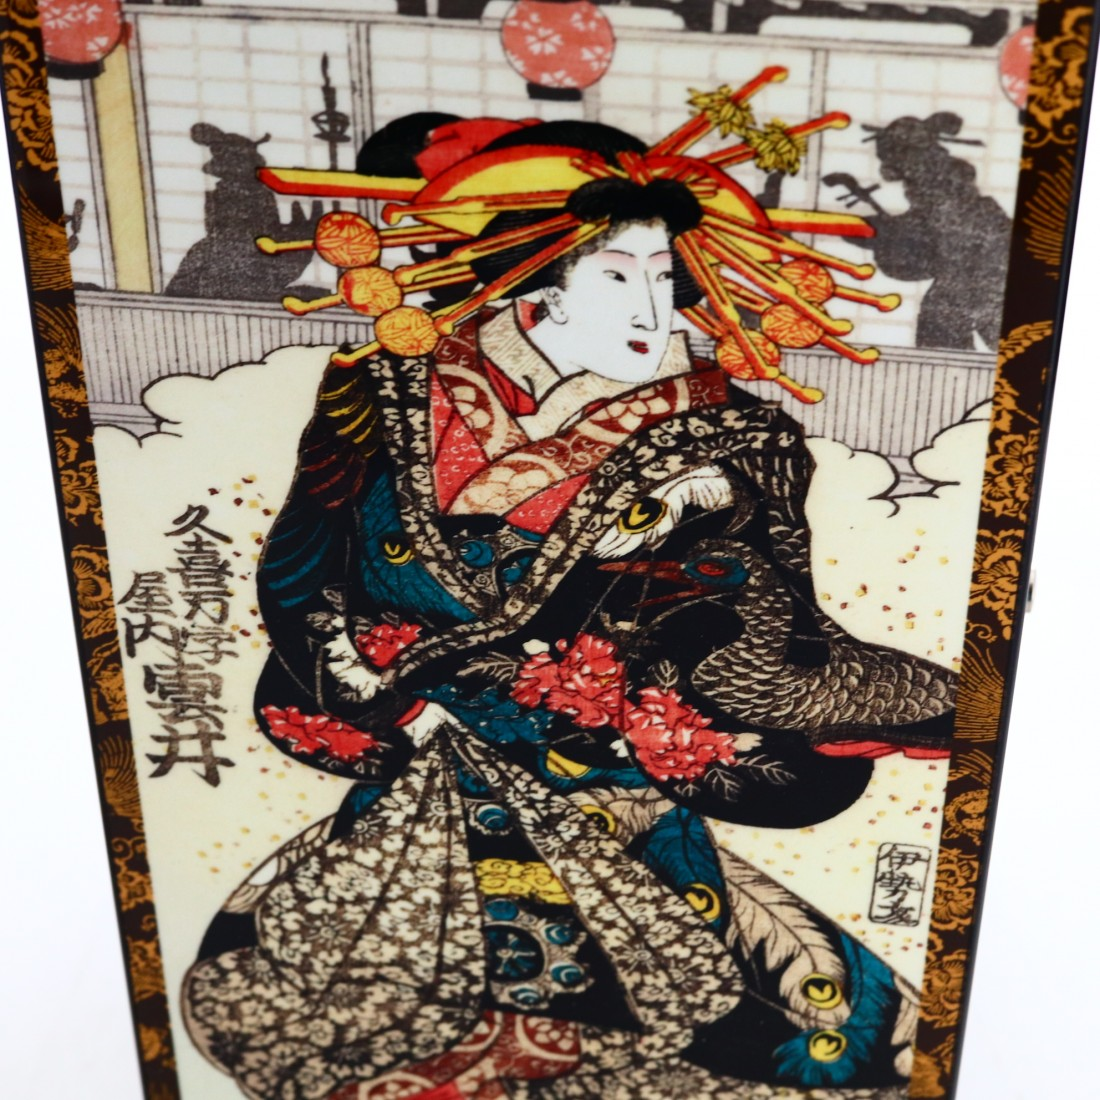 Karuizawa 1981 Single Cask 35 Year Old #6478